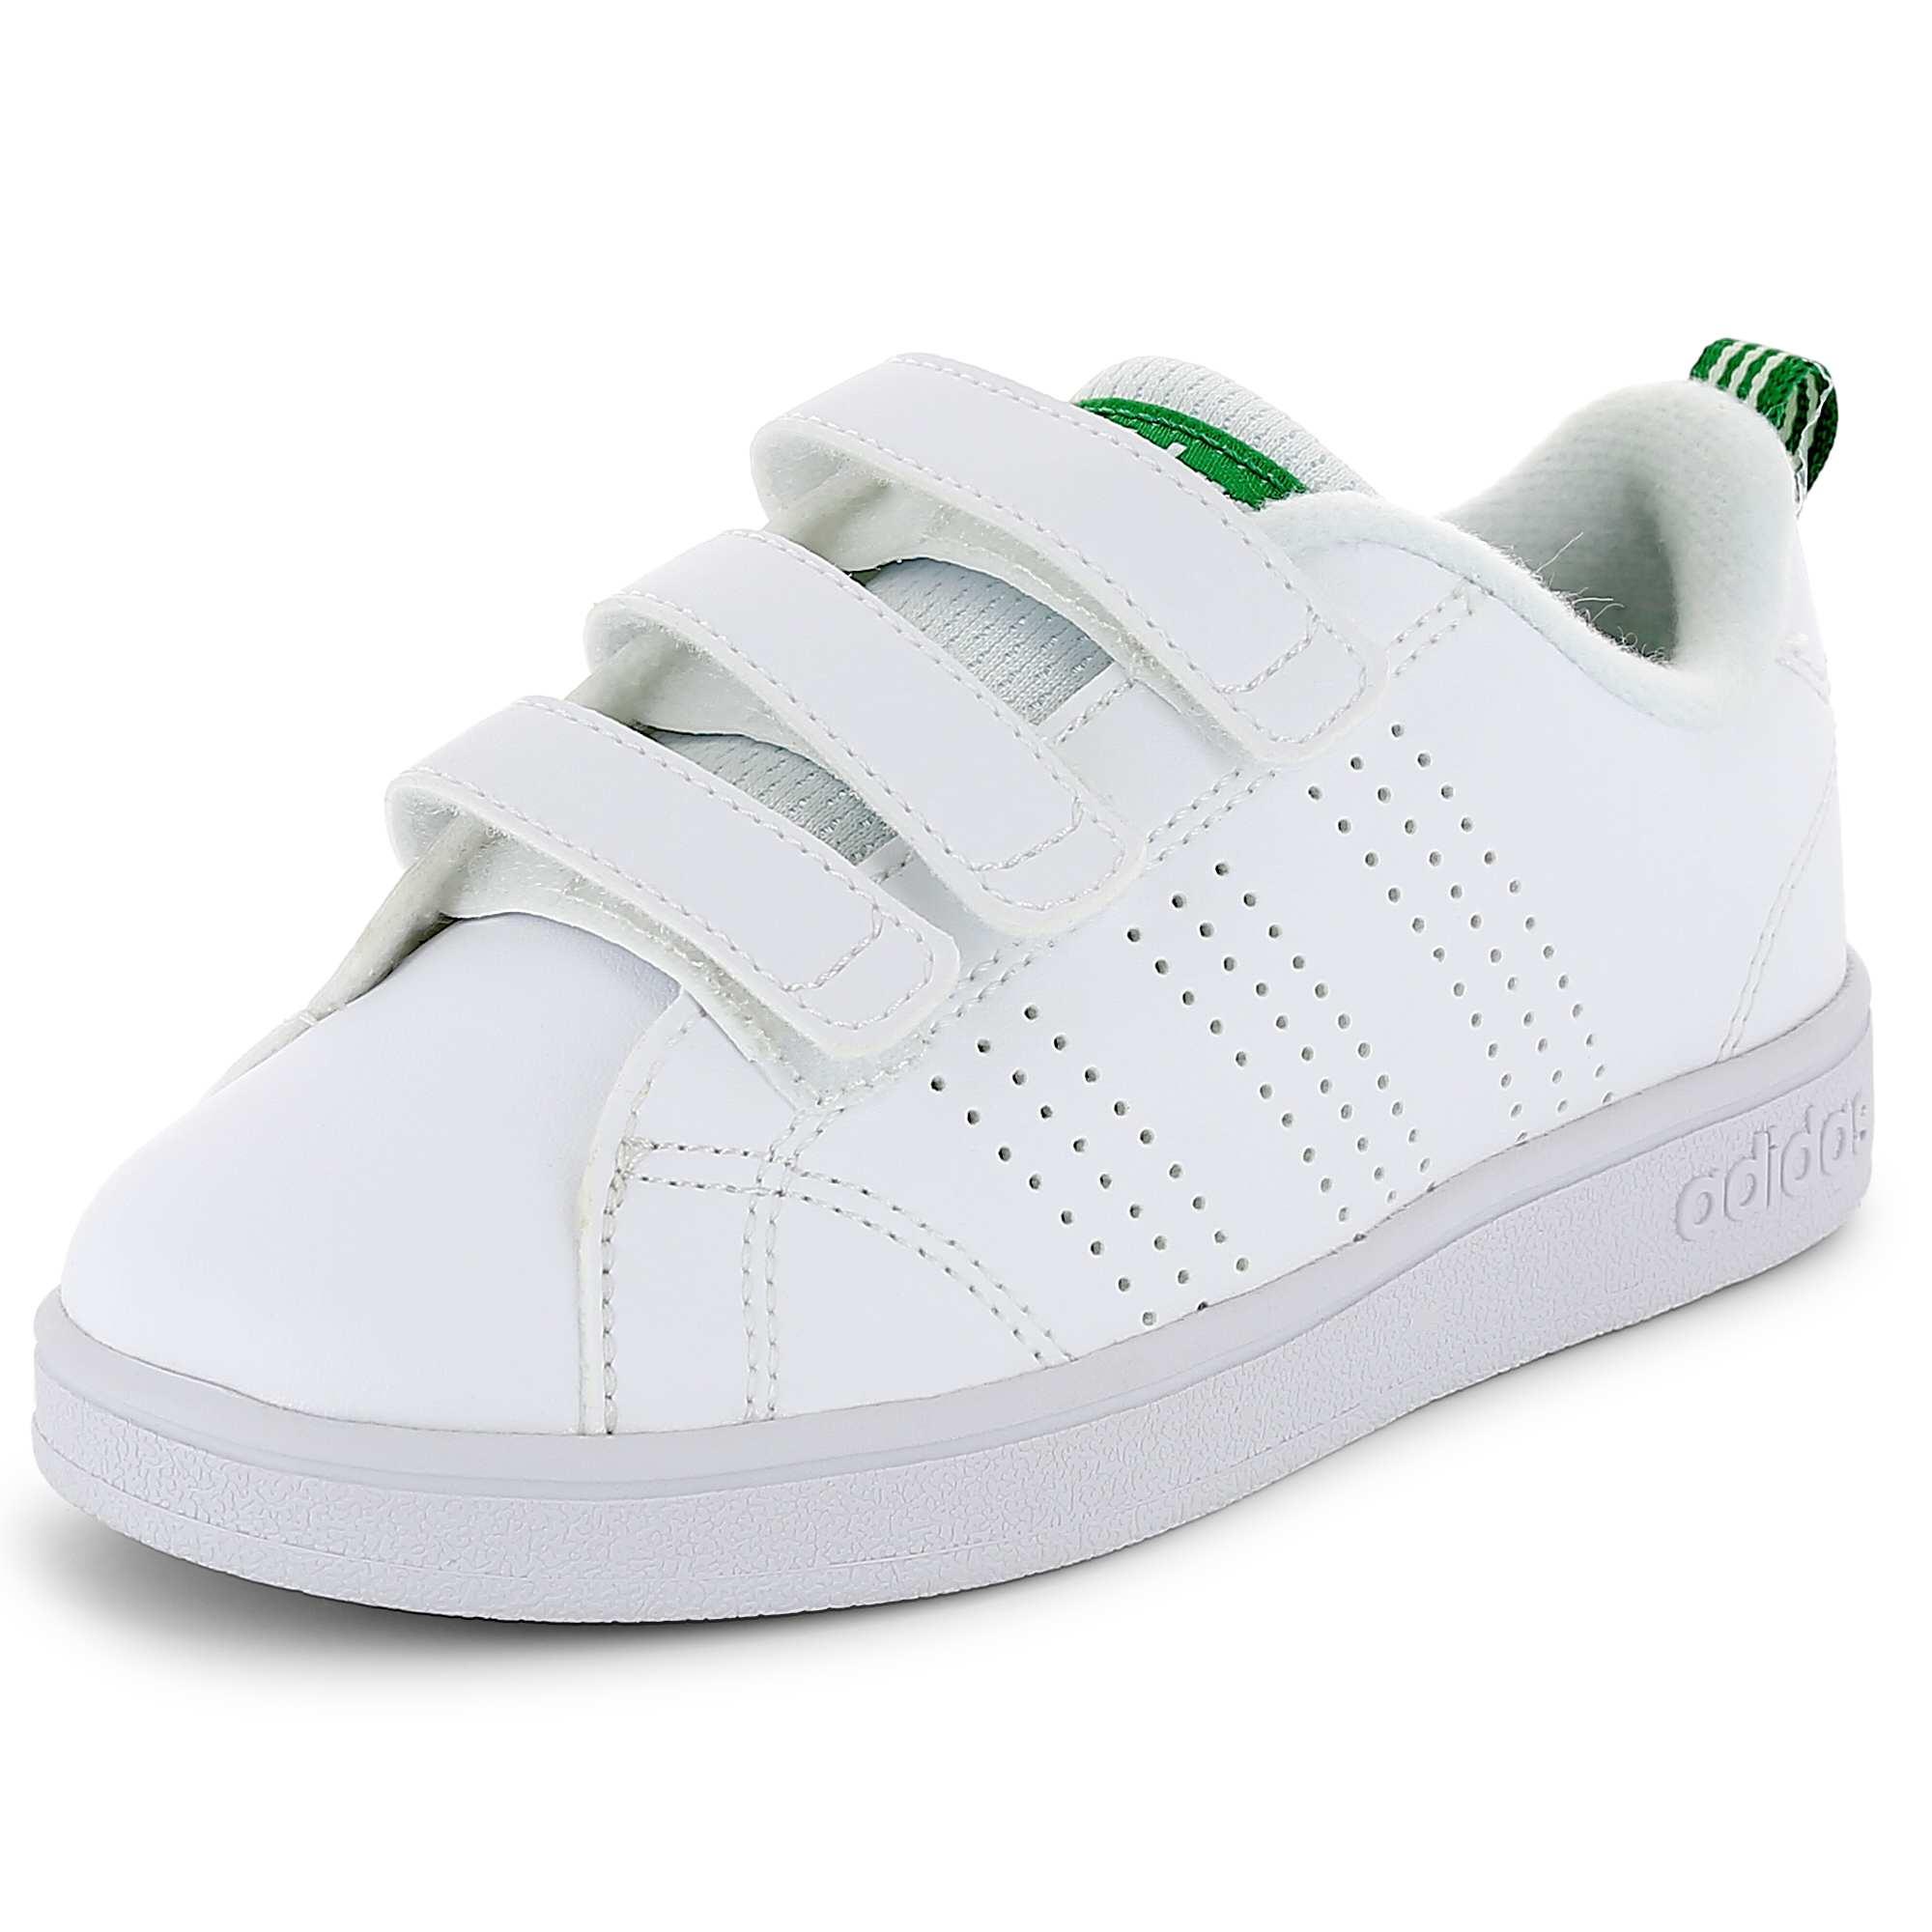 scarpe adidas bimba 3 anni